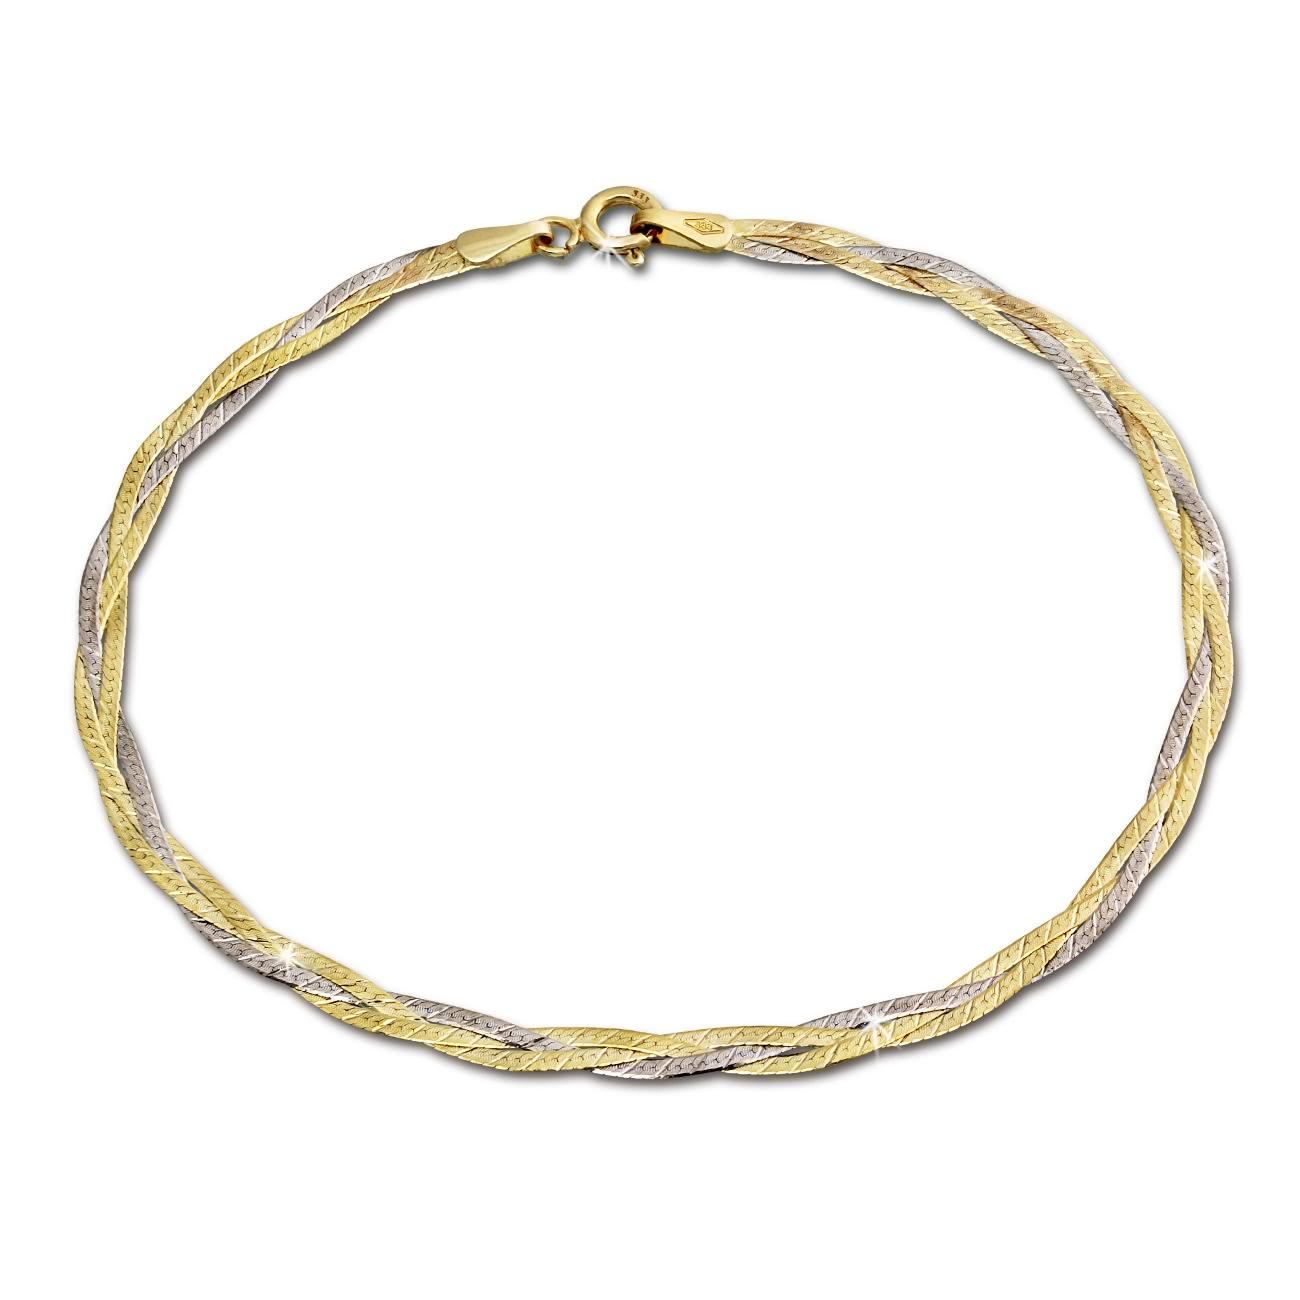 silberdream armband geflochten 333 gold damen 19cm 8 karat gda0009t ebay. Black Bedroom Furniture Sets. Home Design Ideas